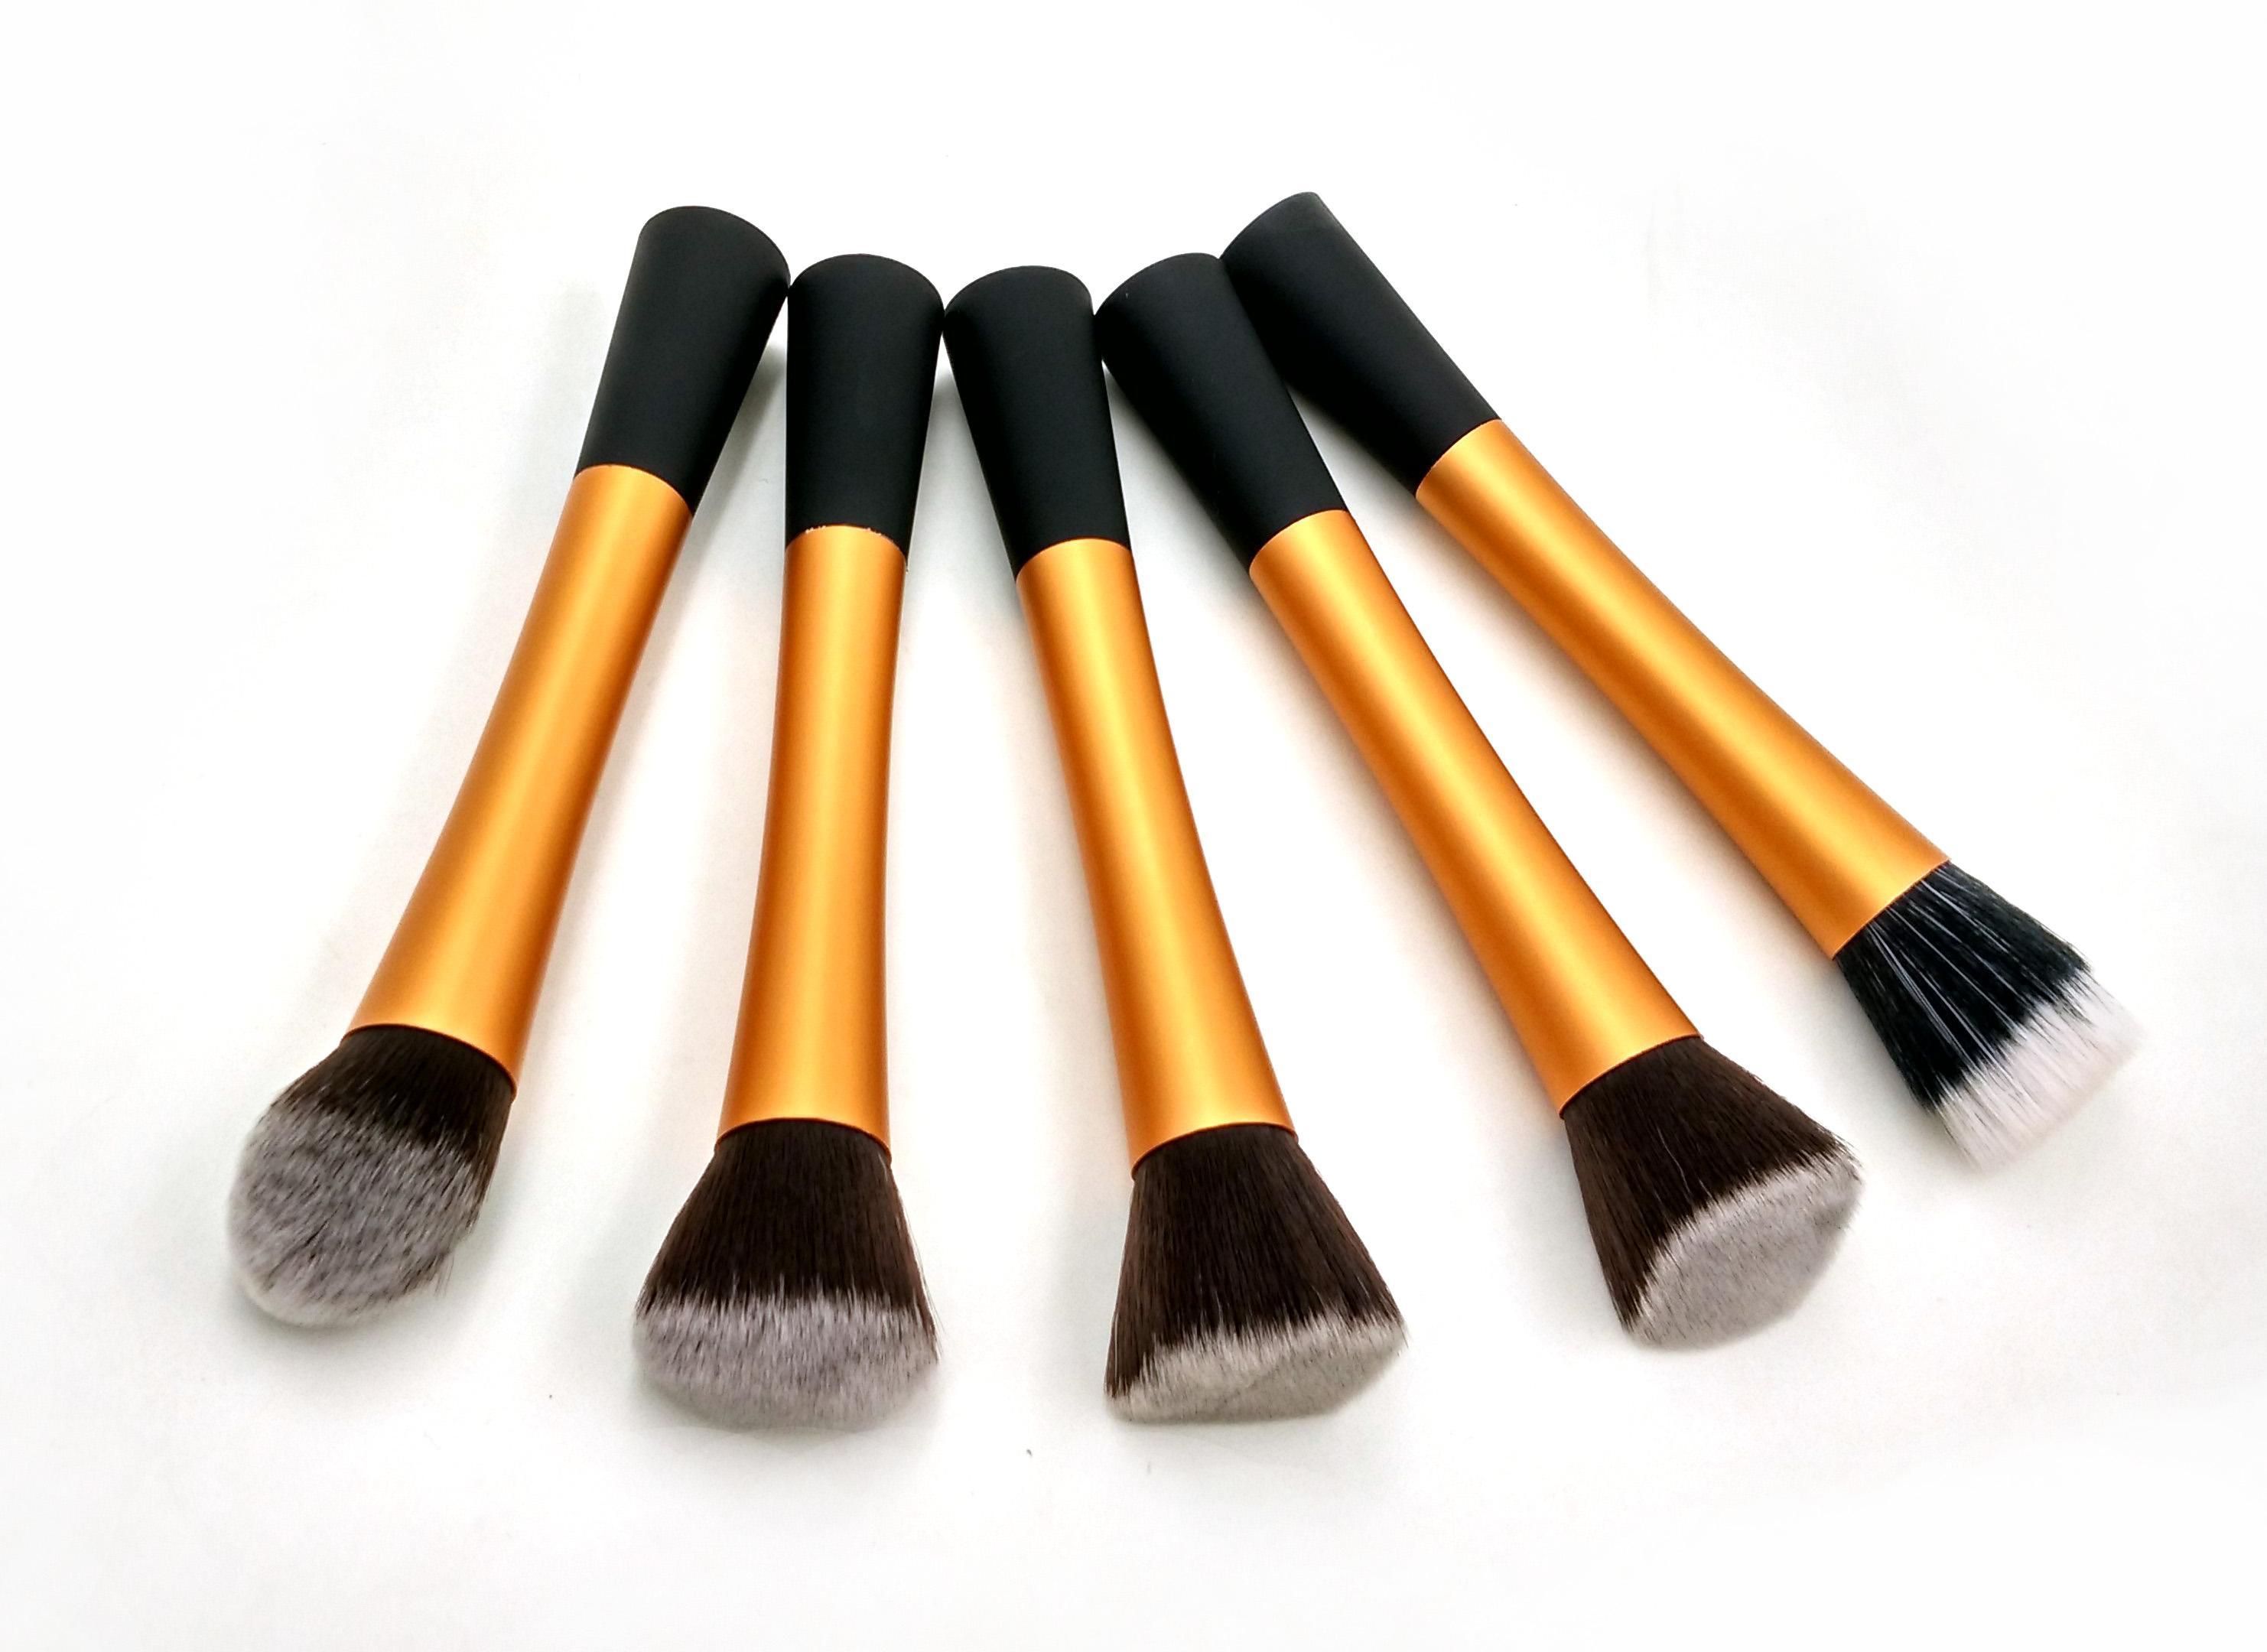 Promotion Makeup Brushes Set Tools Metal Handle Professional Make Up Face Brush Kabuki Brush Facial Care Foundation Brush Best Makeup Foundation Brush Set ...